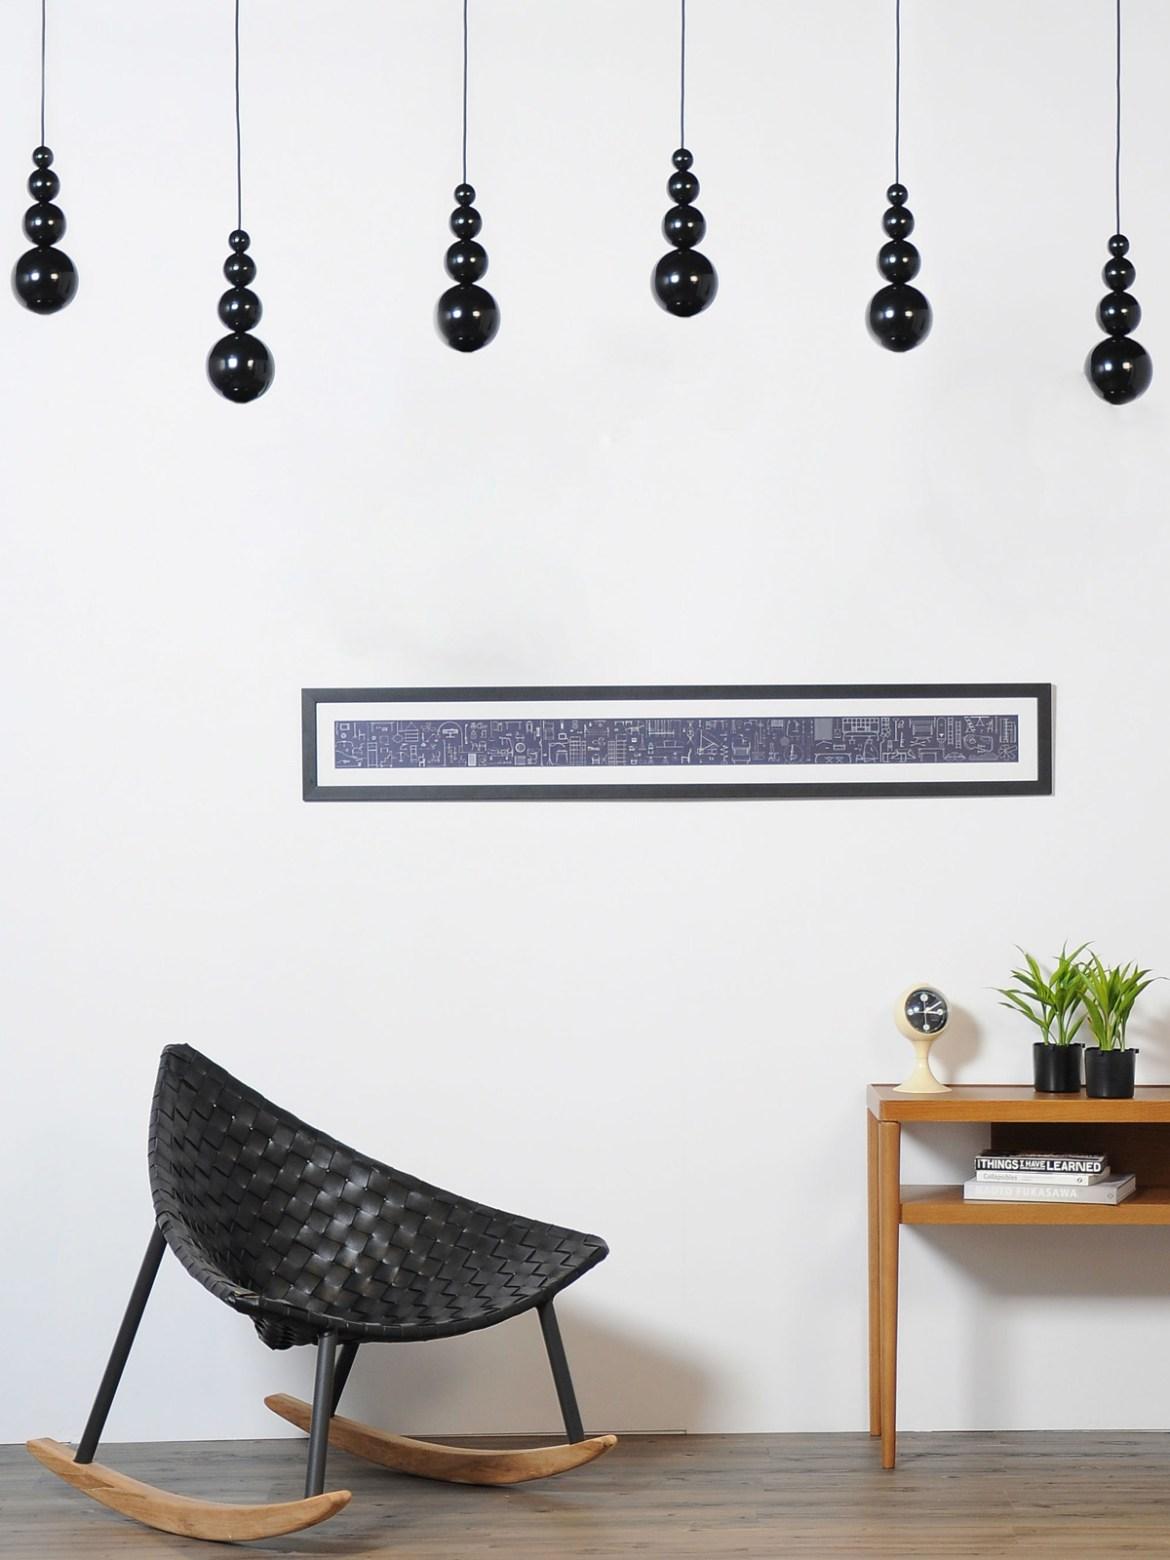 DesignOrt Blog: Kugelige Pendelleuchten Kugellampe Bubble Innermost Downlight